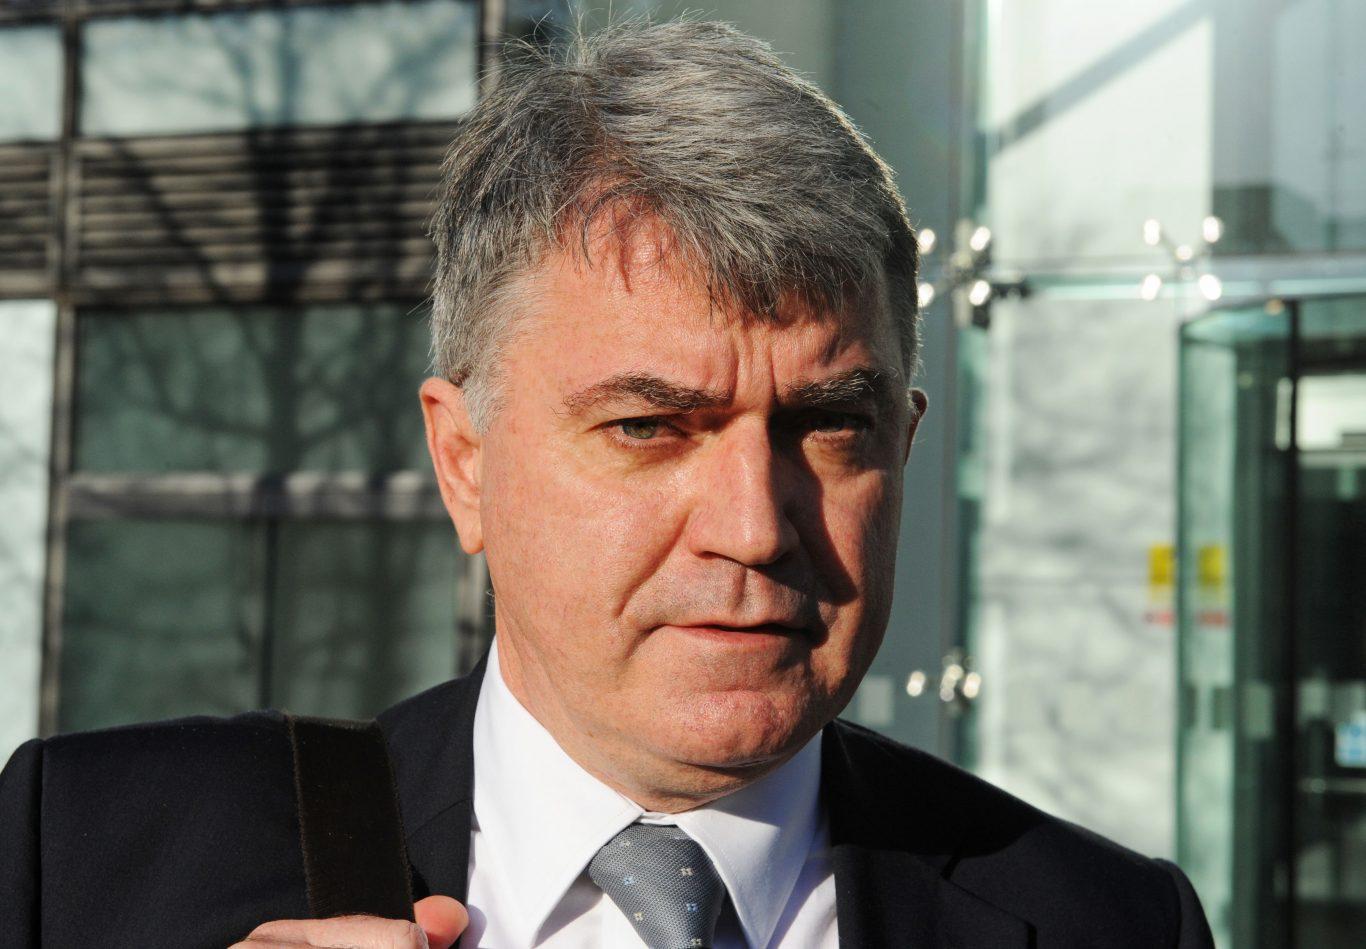 RMT General Secretary Mick Cash members were angry (Nick Ansell/PA)